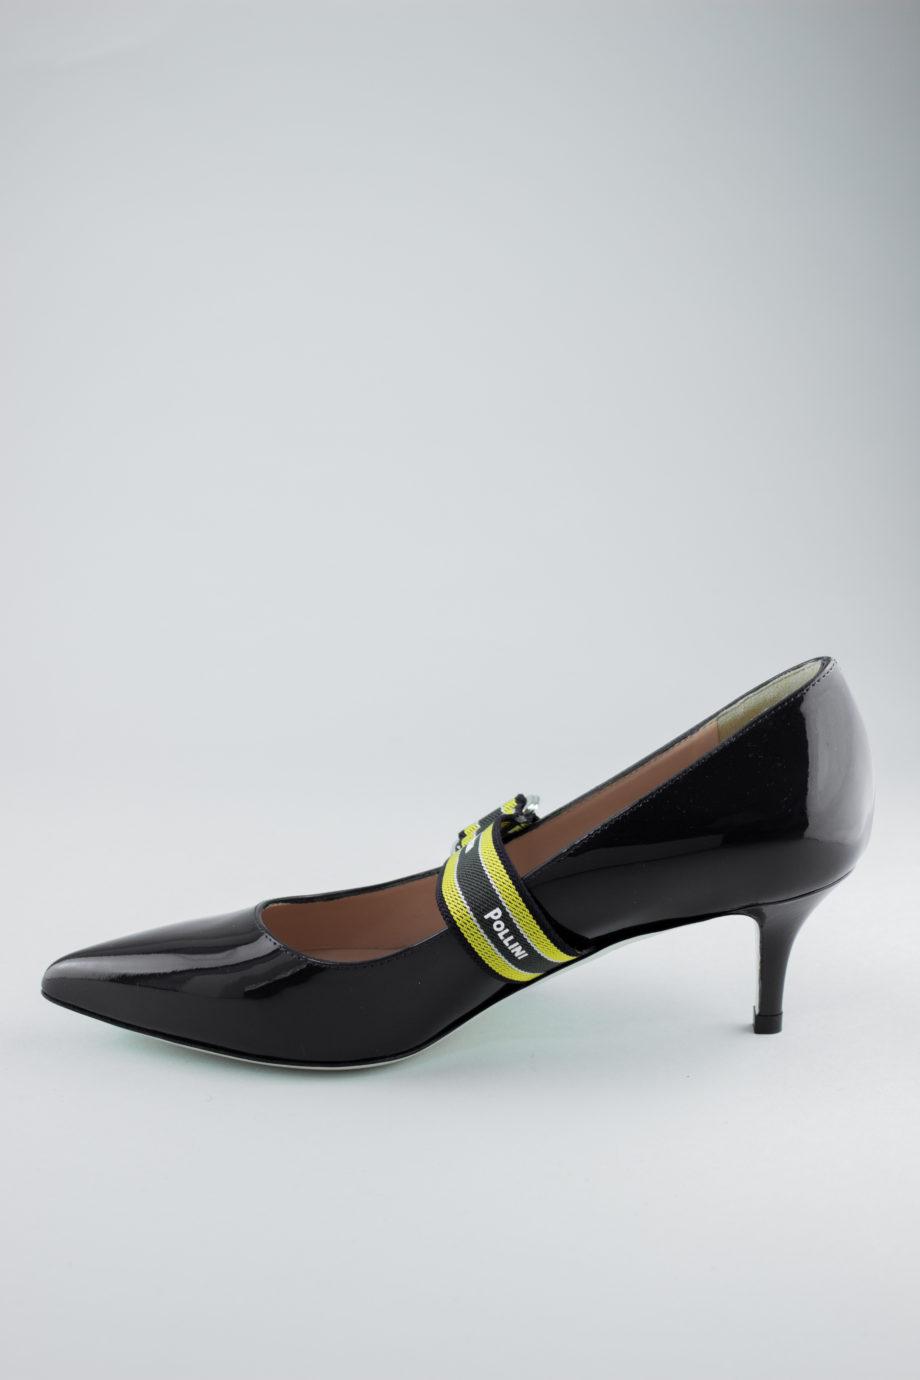 Pollini logo heels